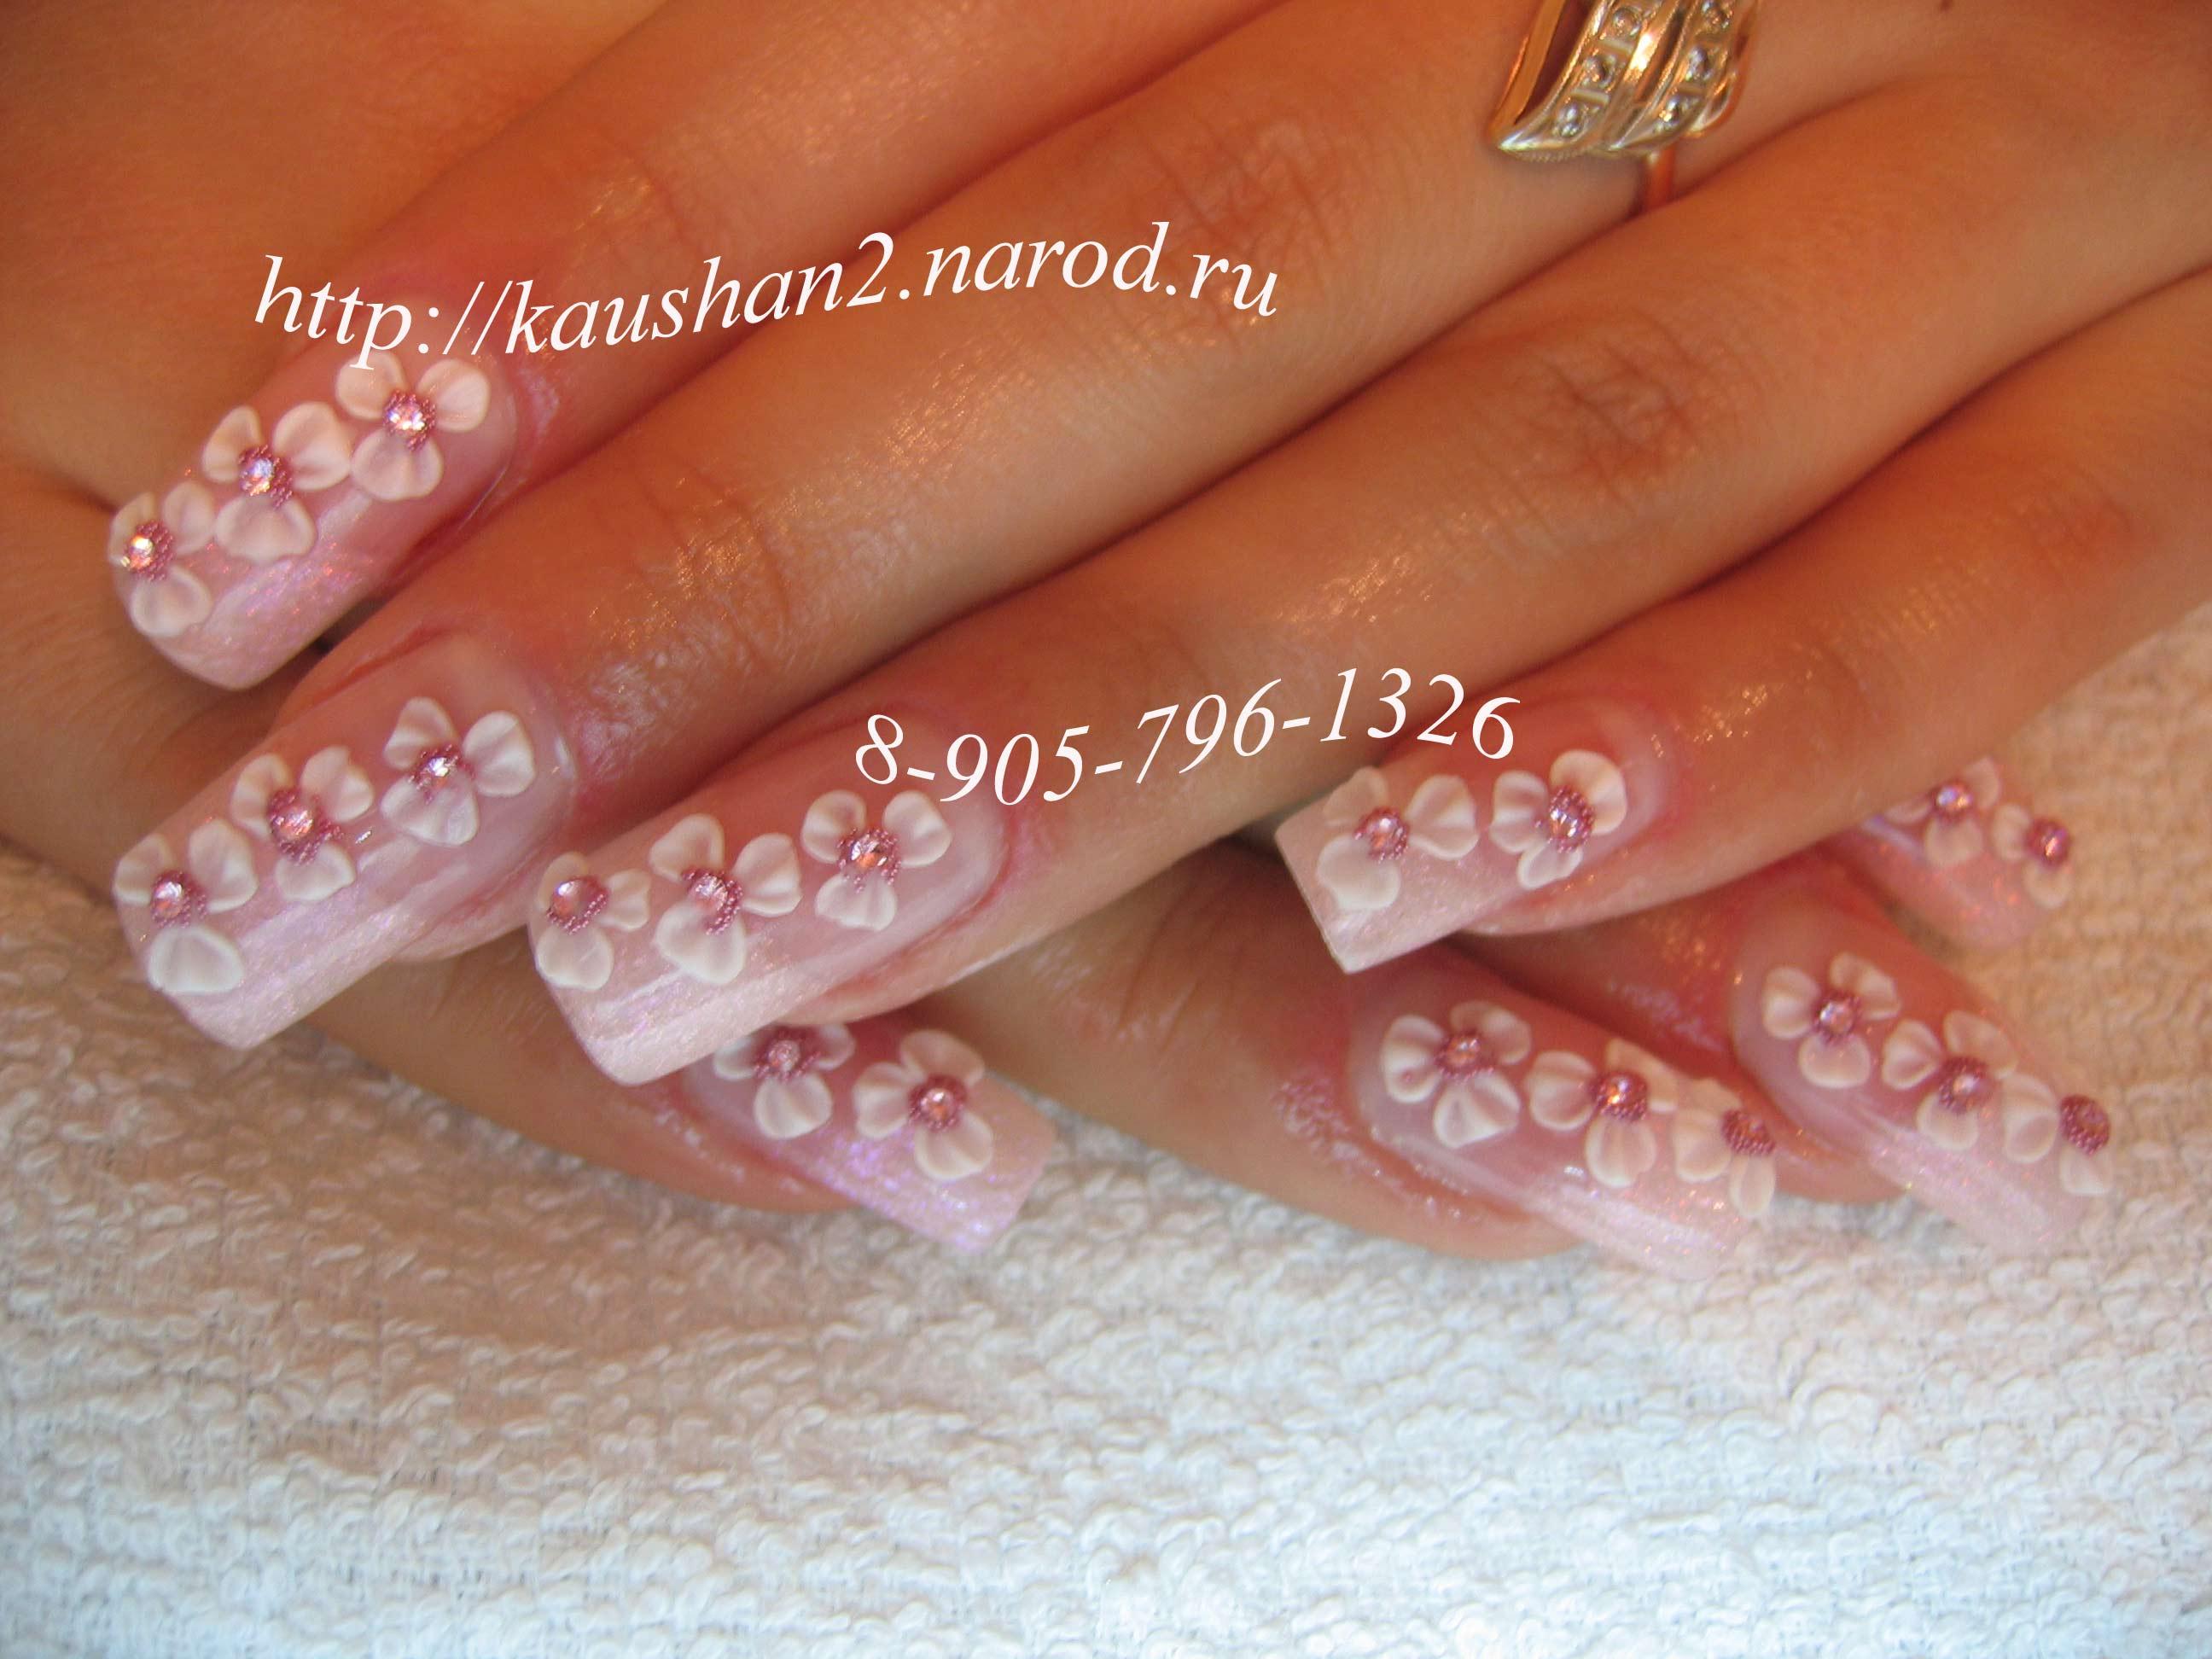 картинки дизайн наращивание ногтей: